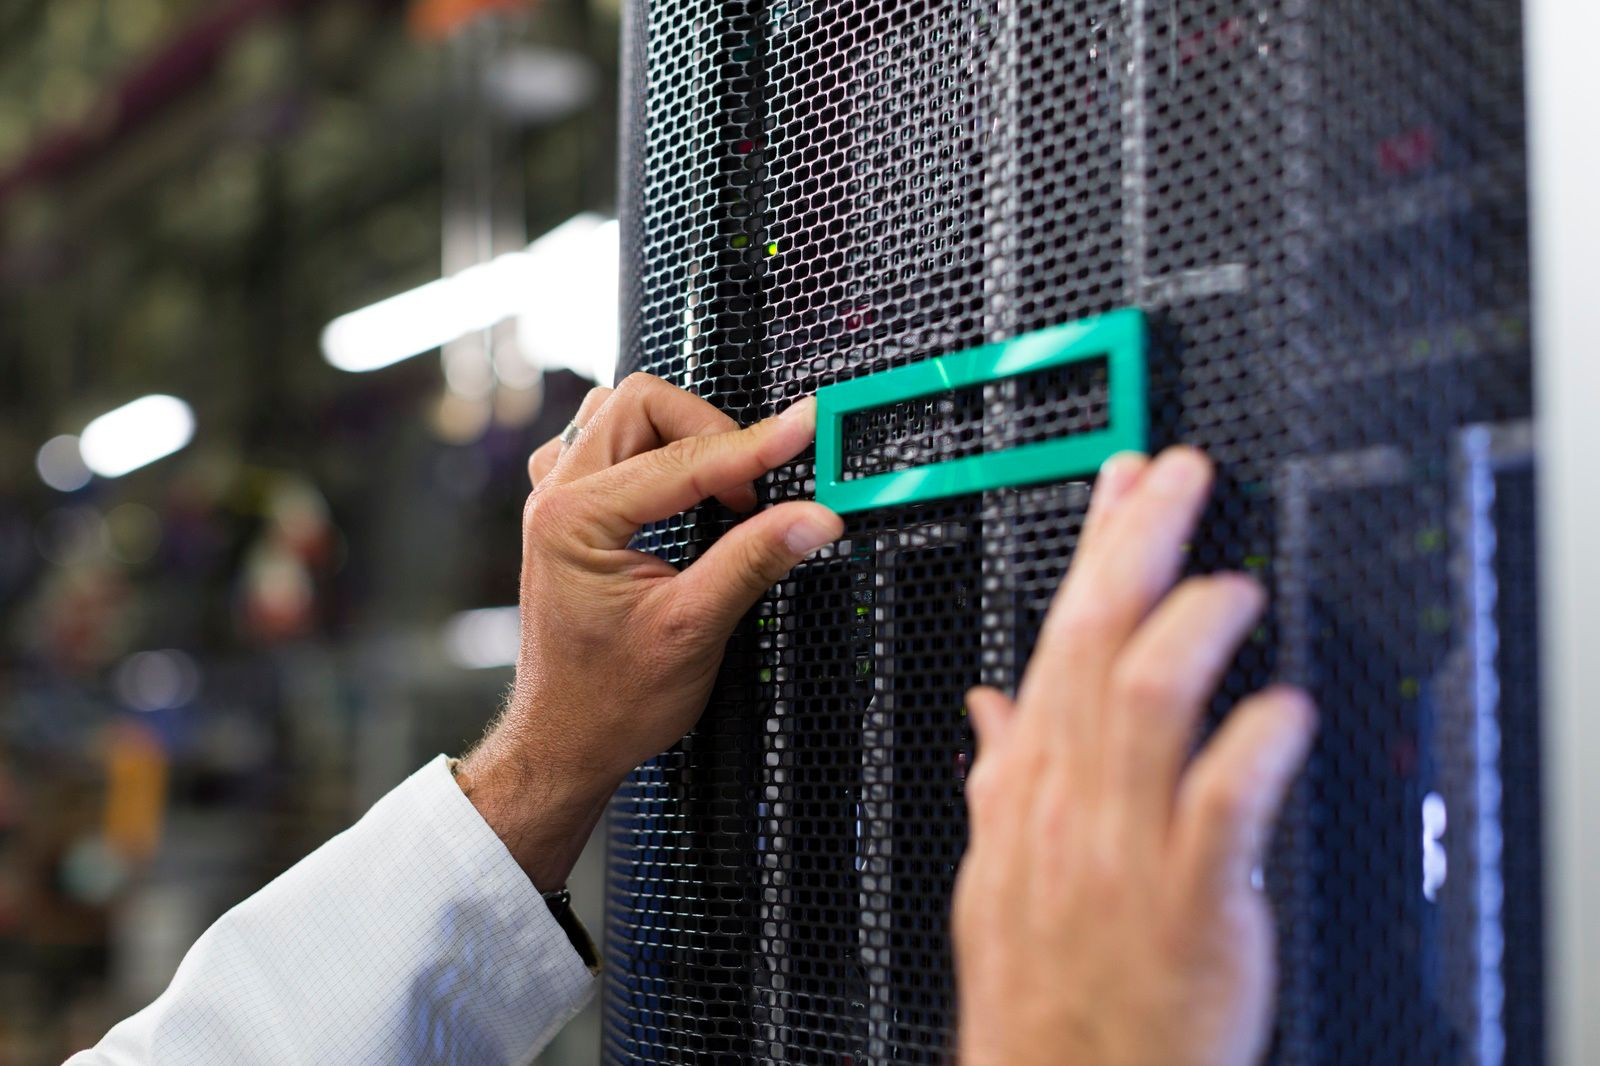 HPE Servers Twitter Image.jpg